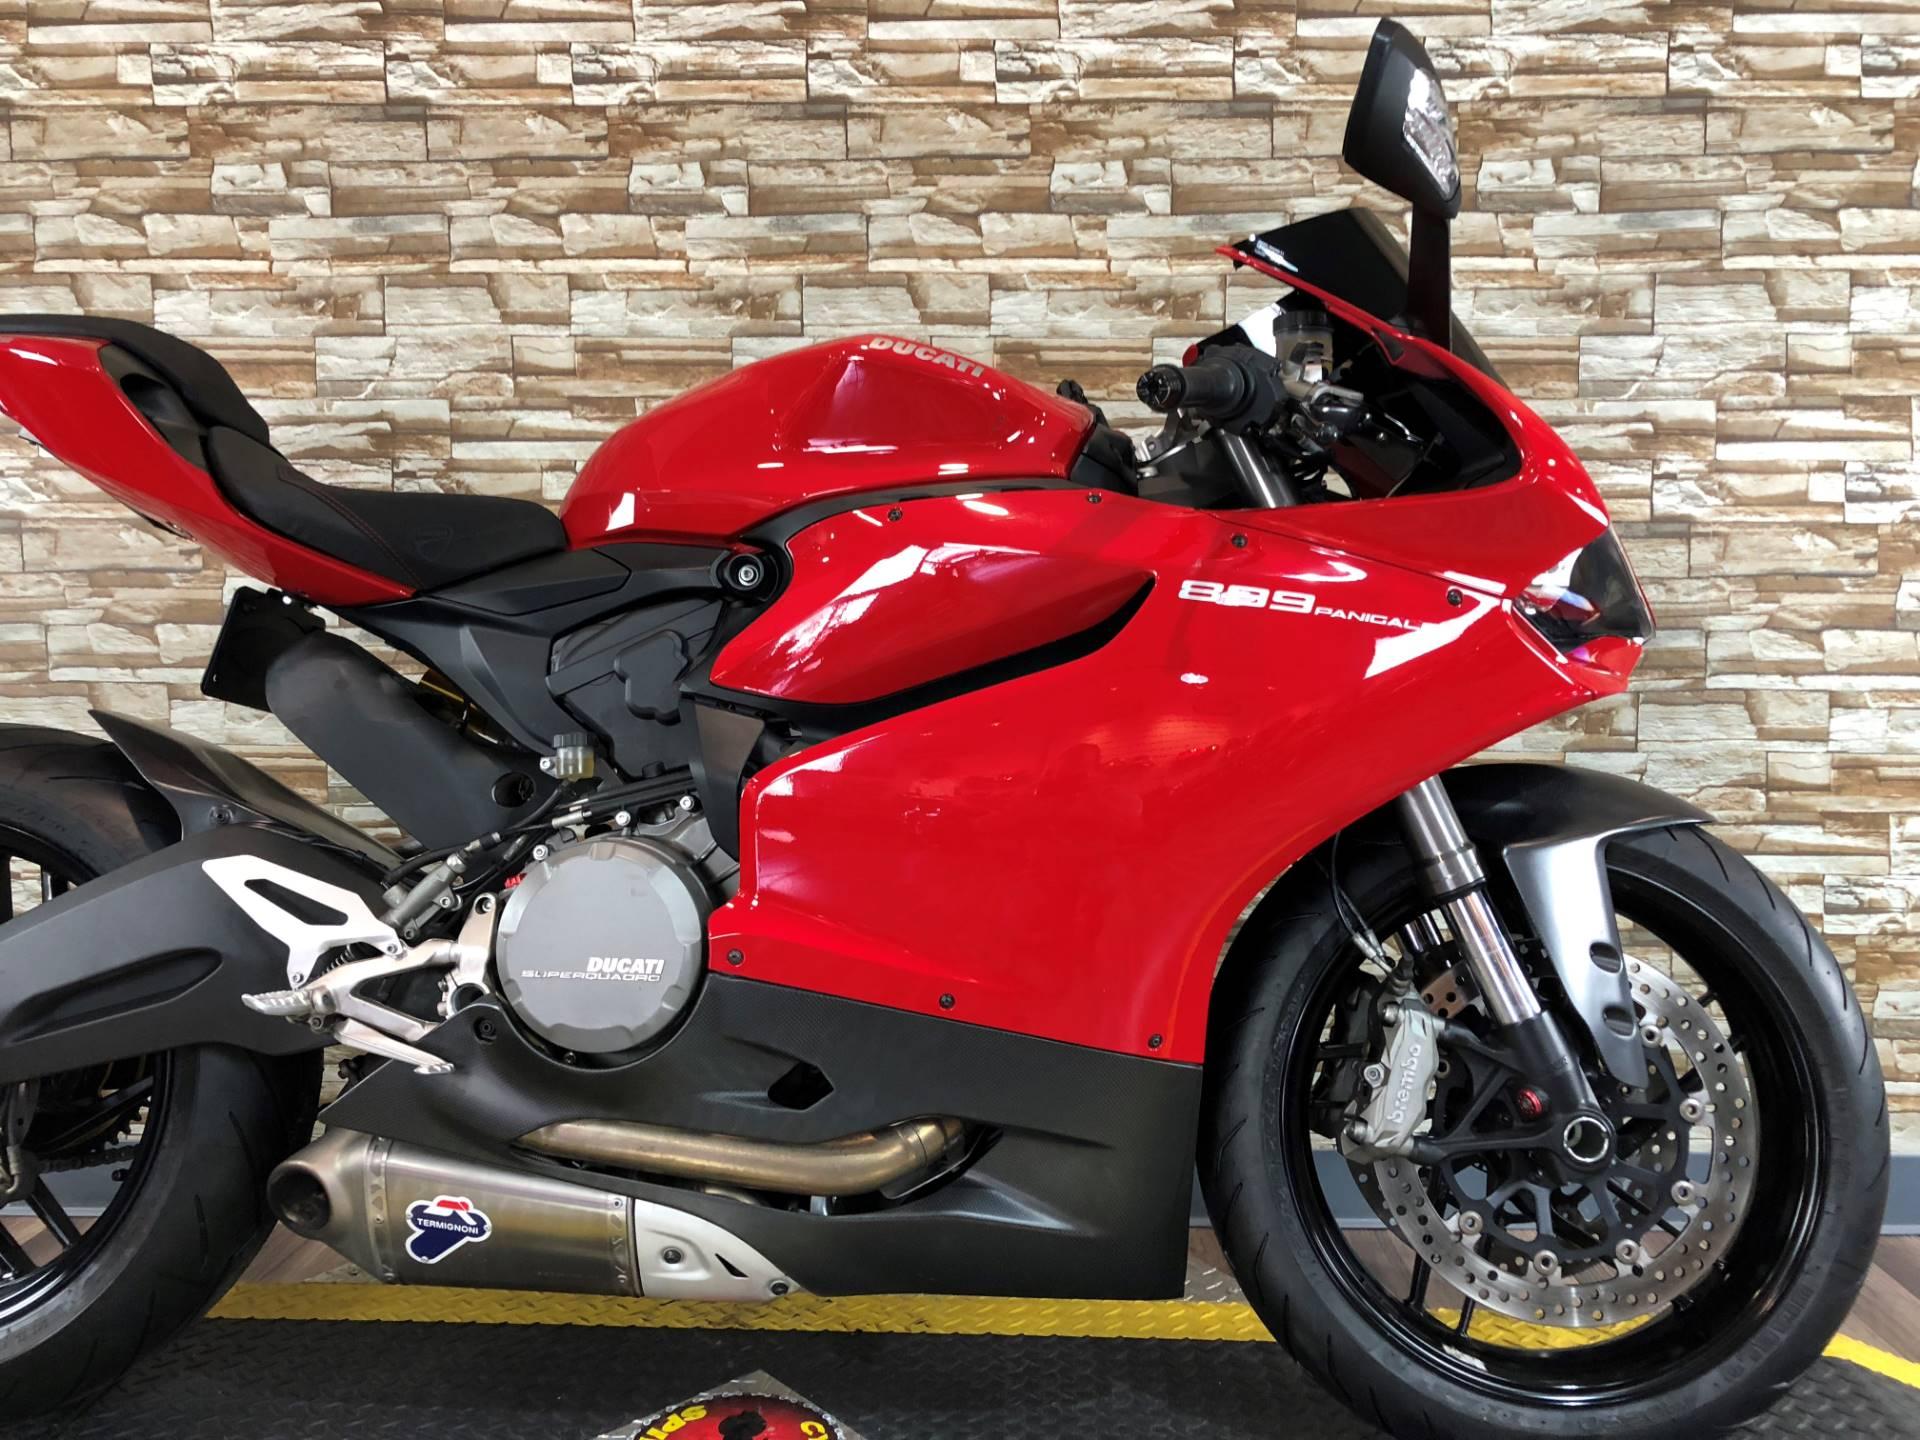 2014 Ducati Superbike 899 Panigale 12